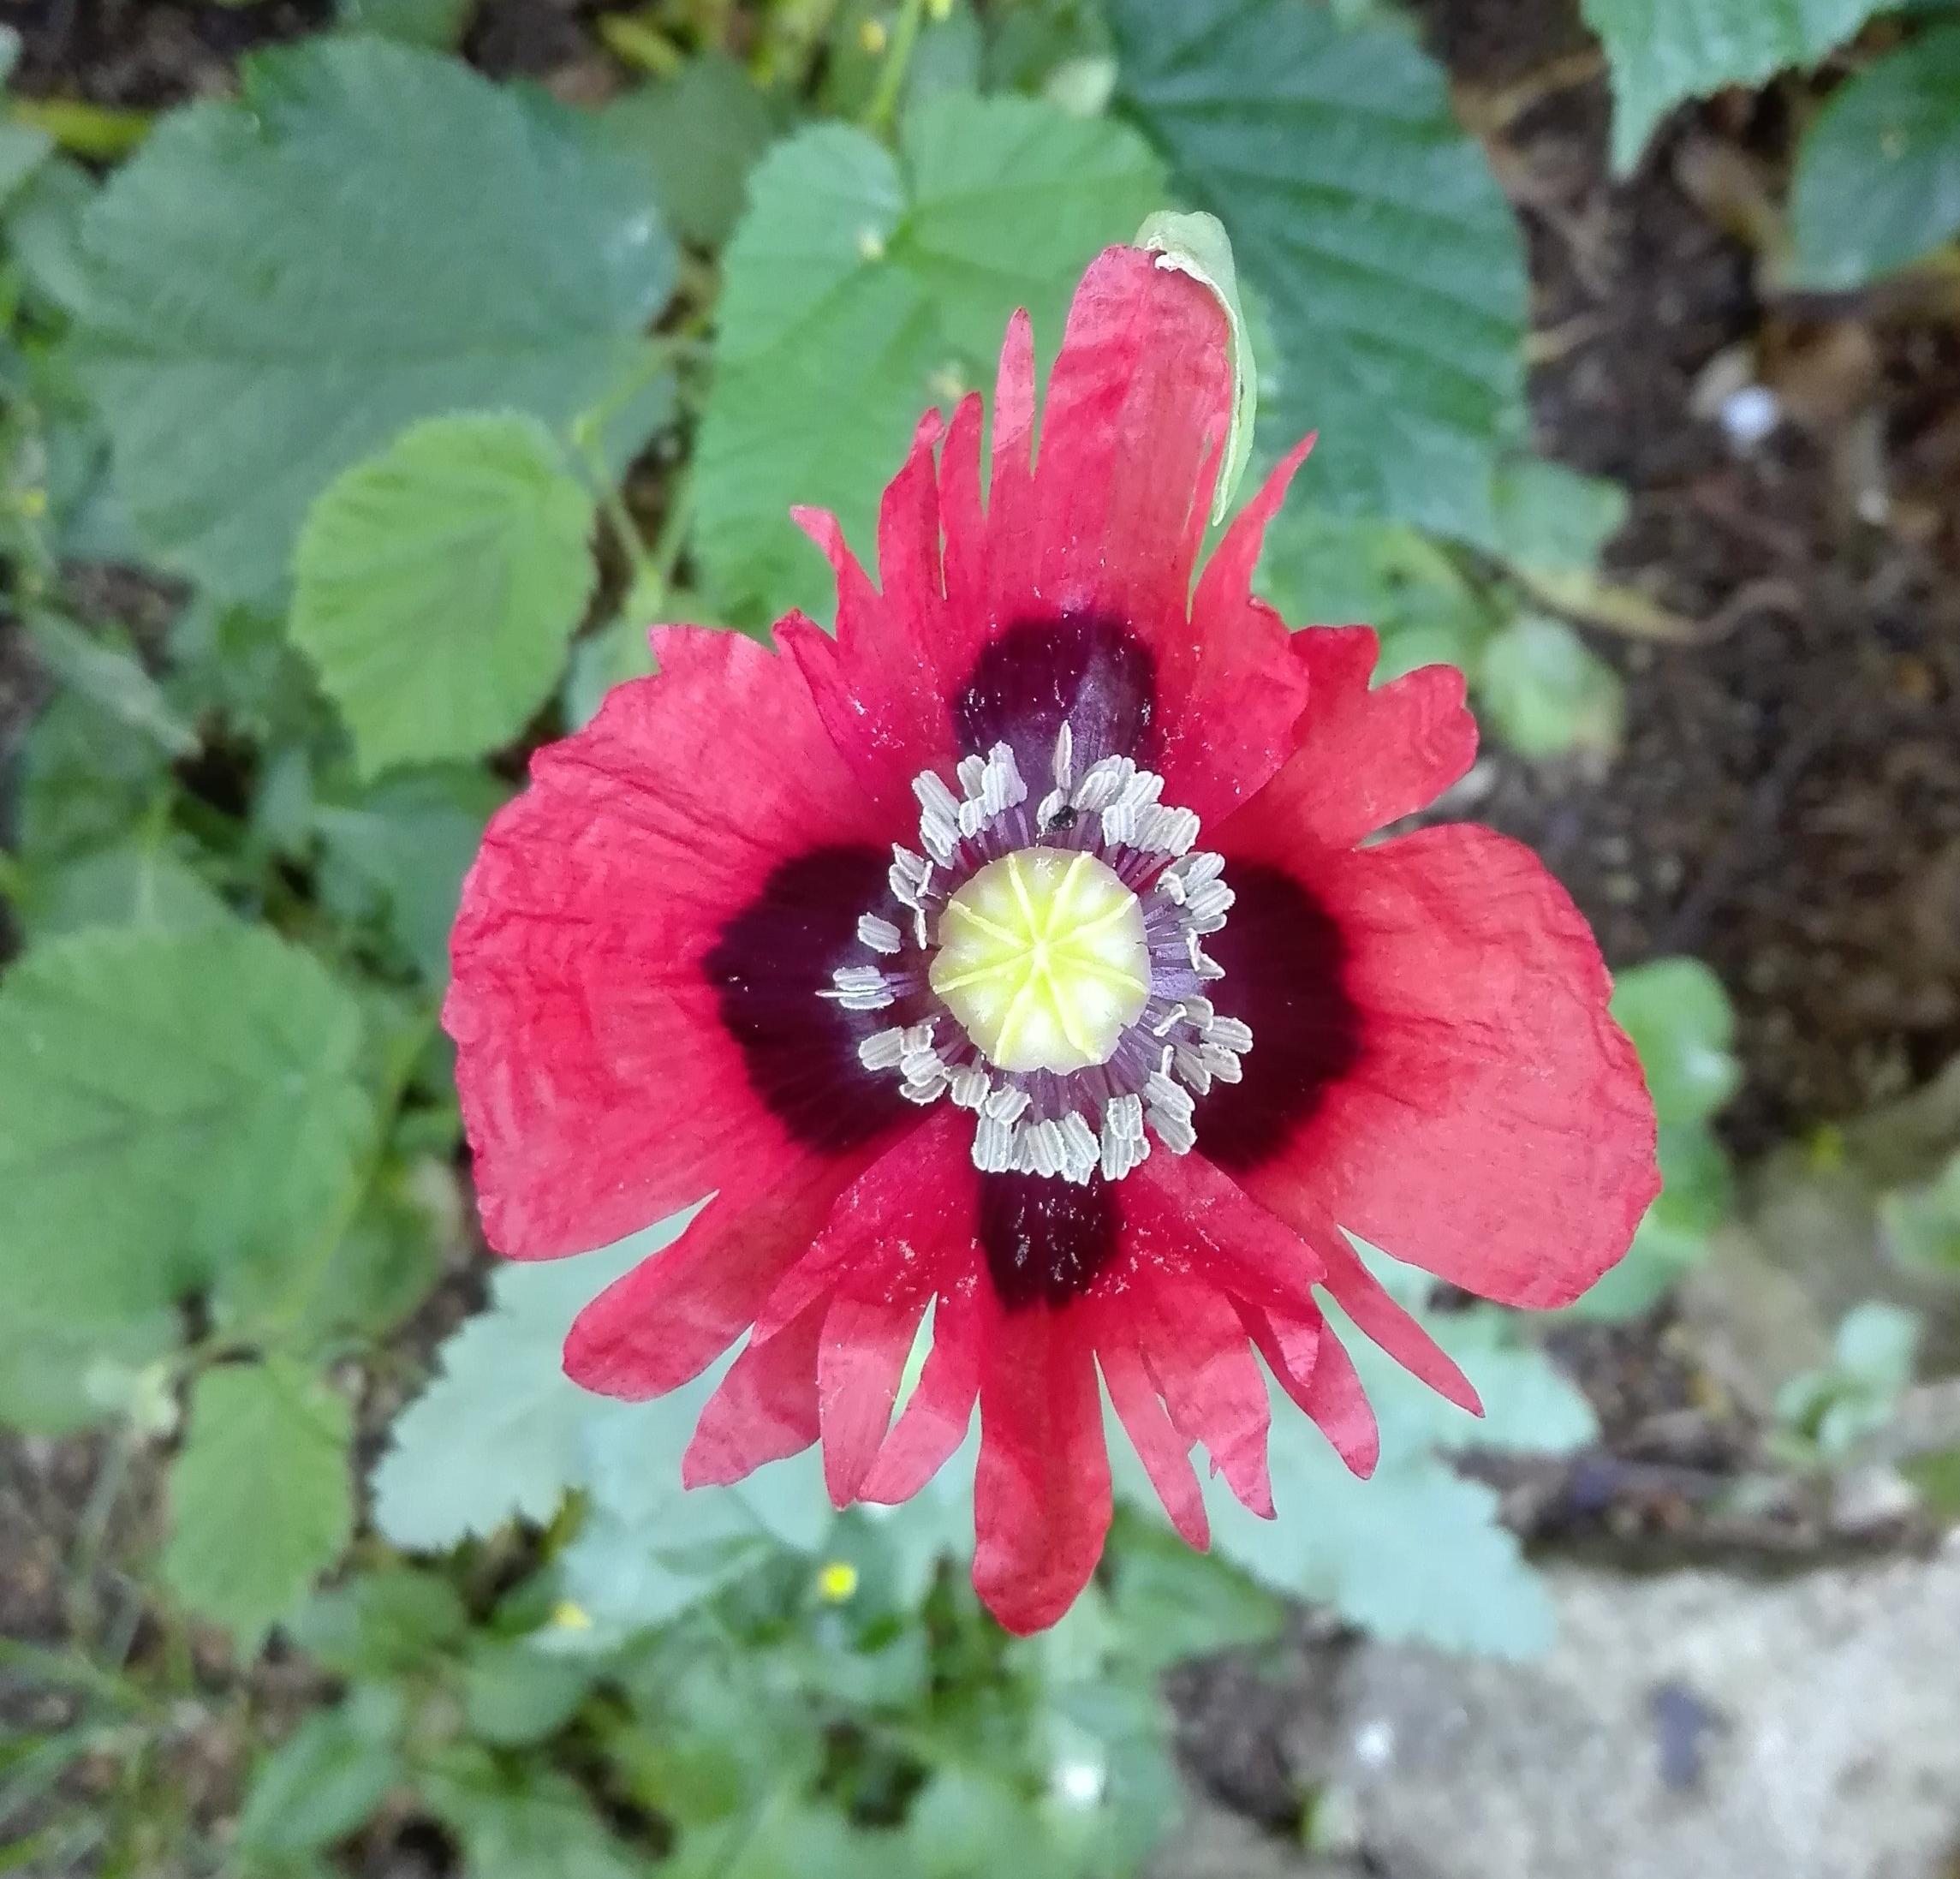 #175 Opium Poppy